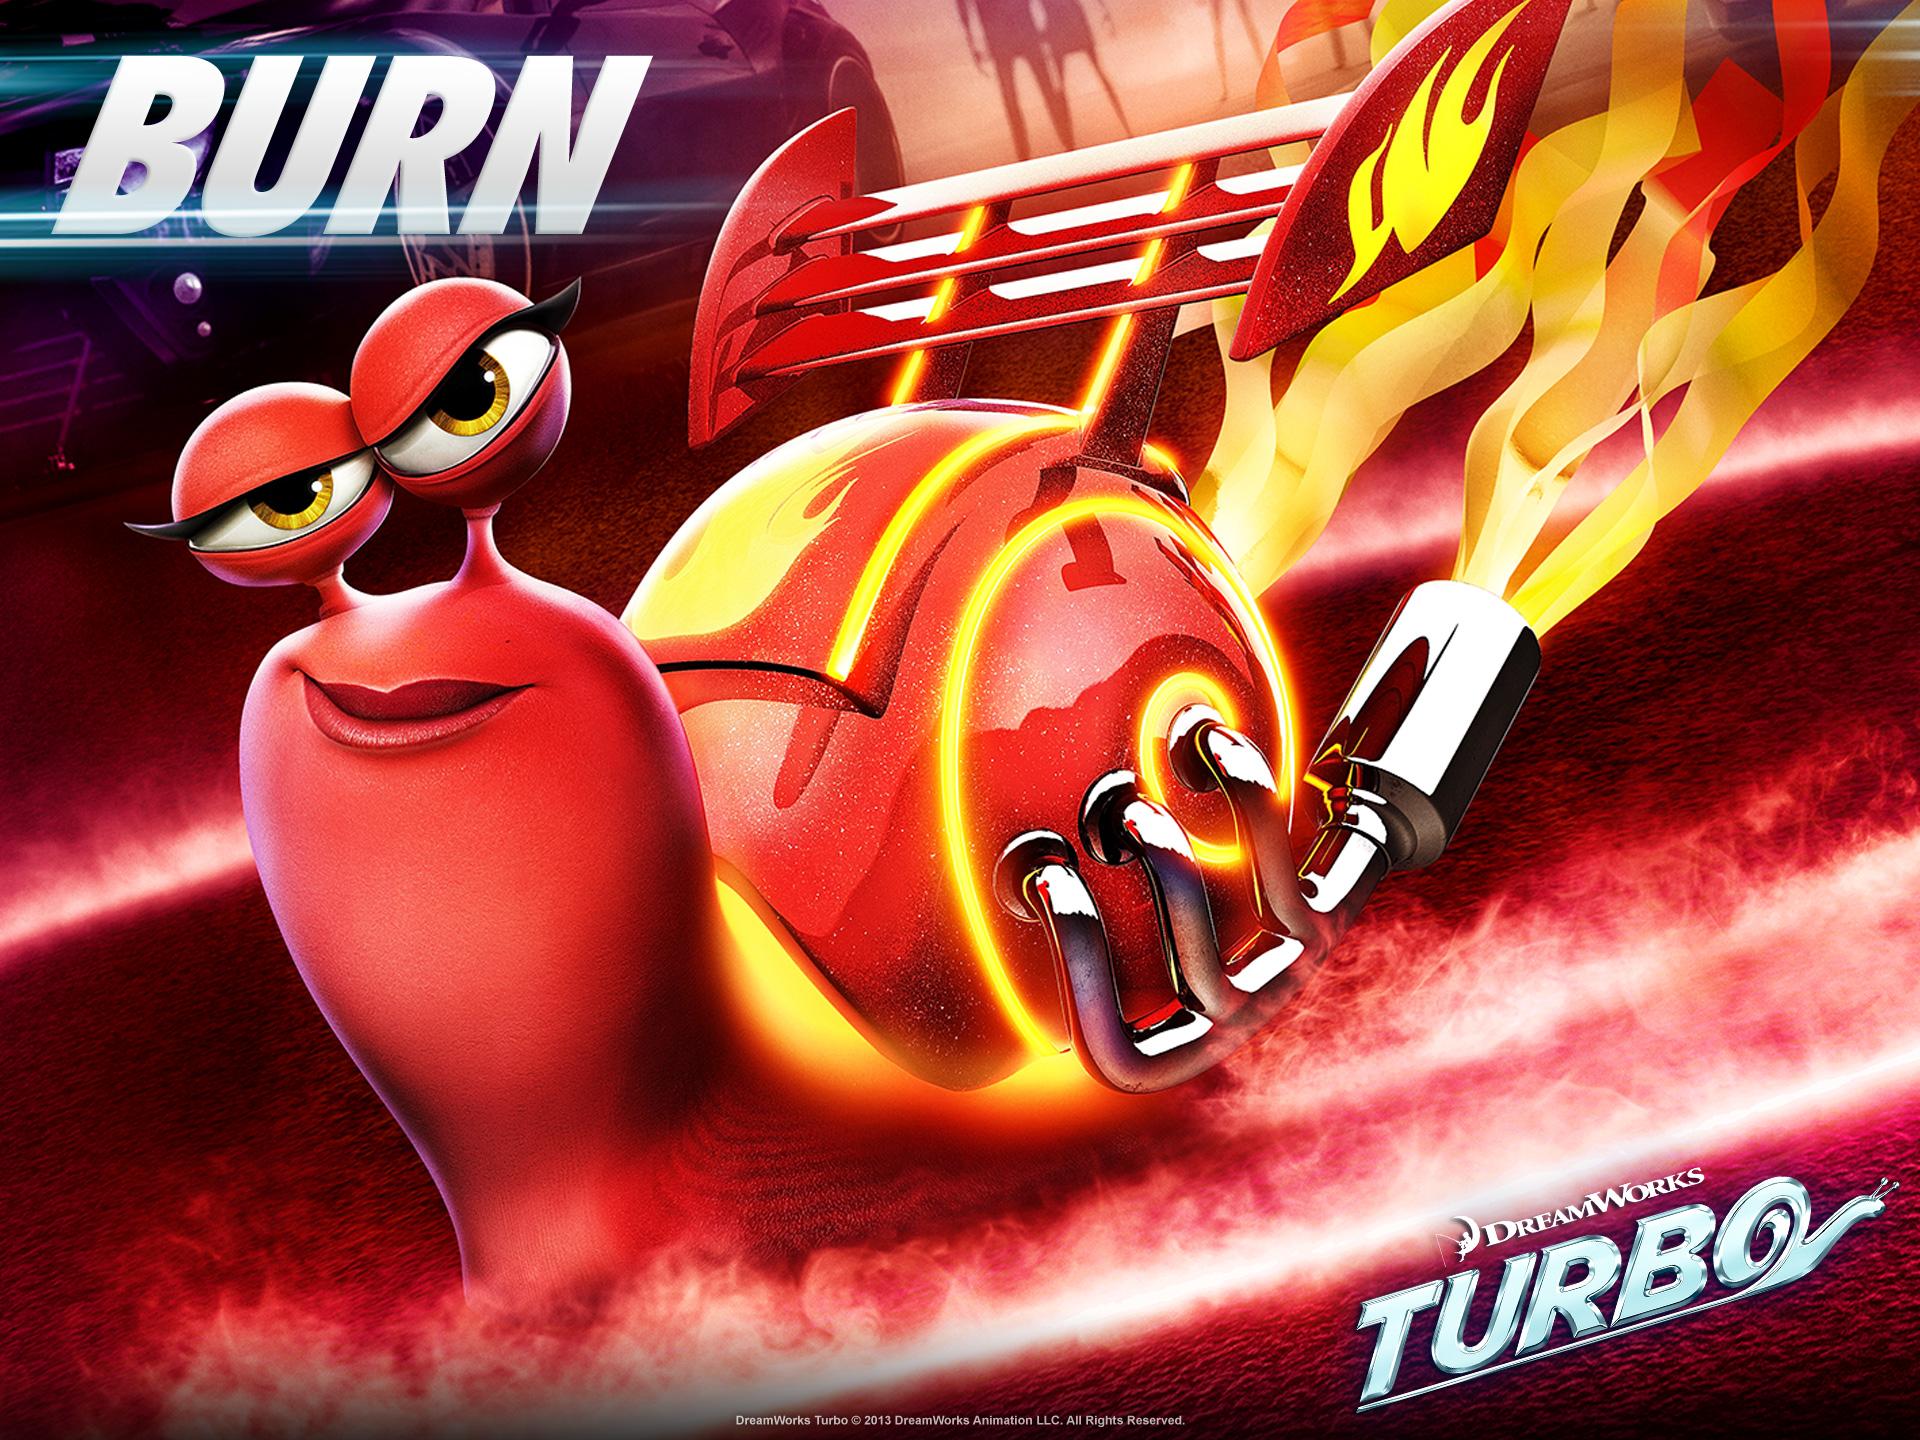 Turbo HD Wallpaper Background Image 1920x1440 ID510964 1920x1440